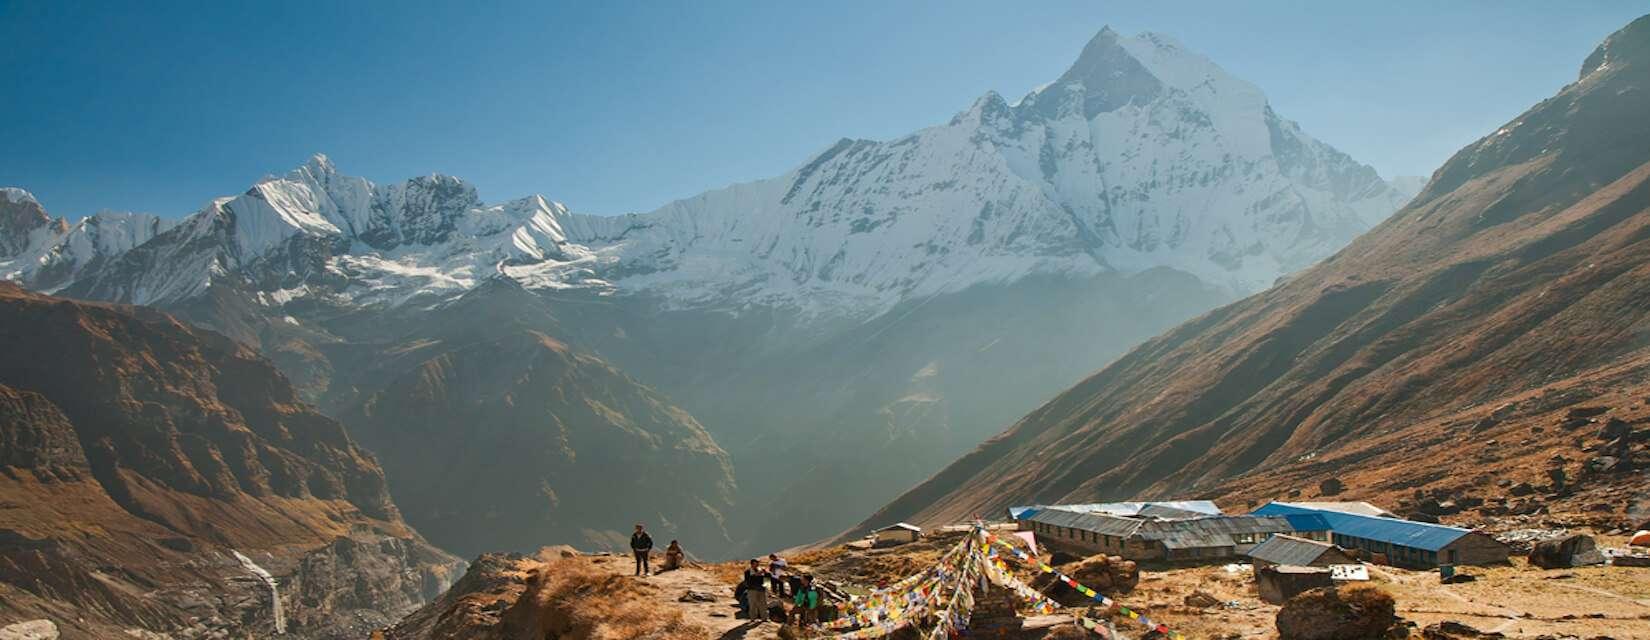 Is Annapurna Base Camp Trek Difficulty